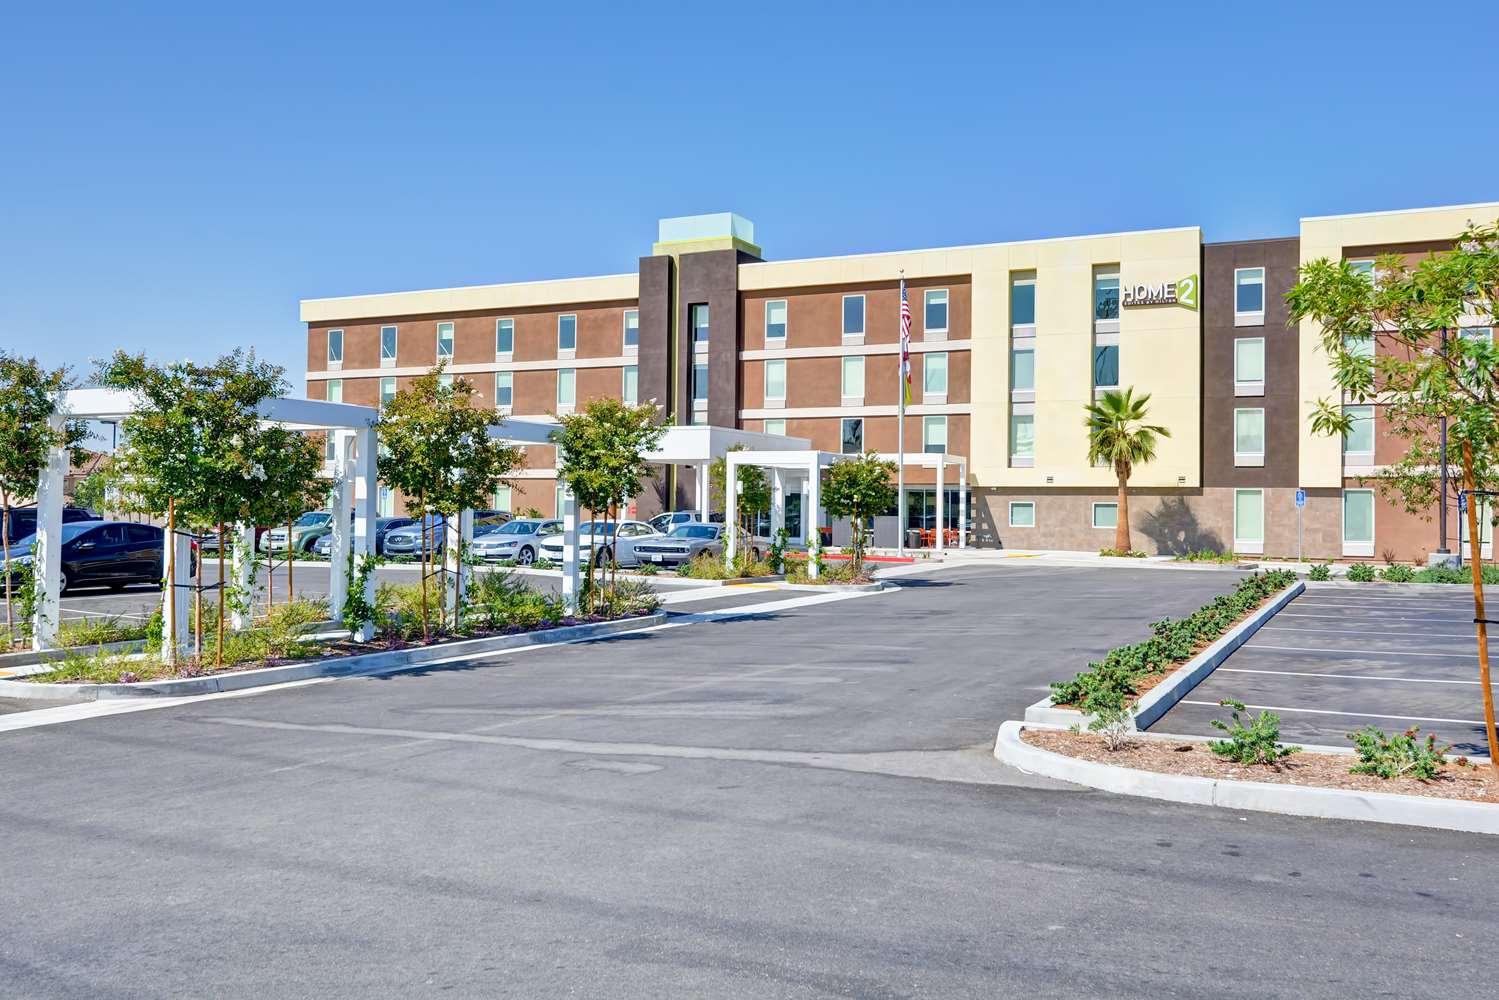 Exterior view - Home2 Suites by Hilton Azusa